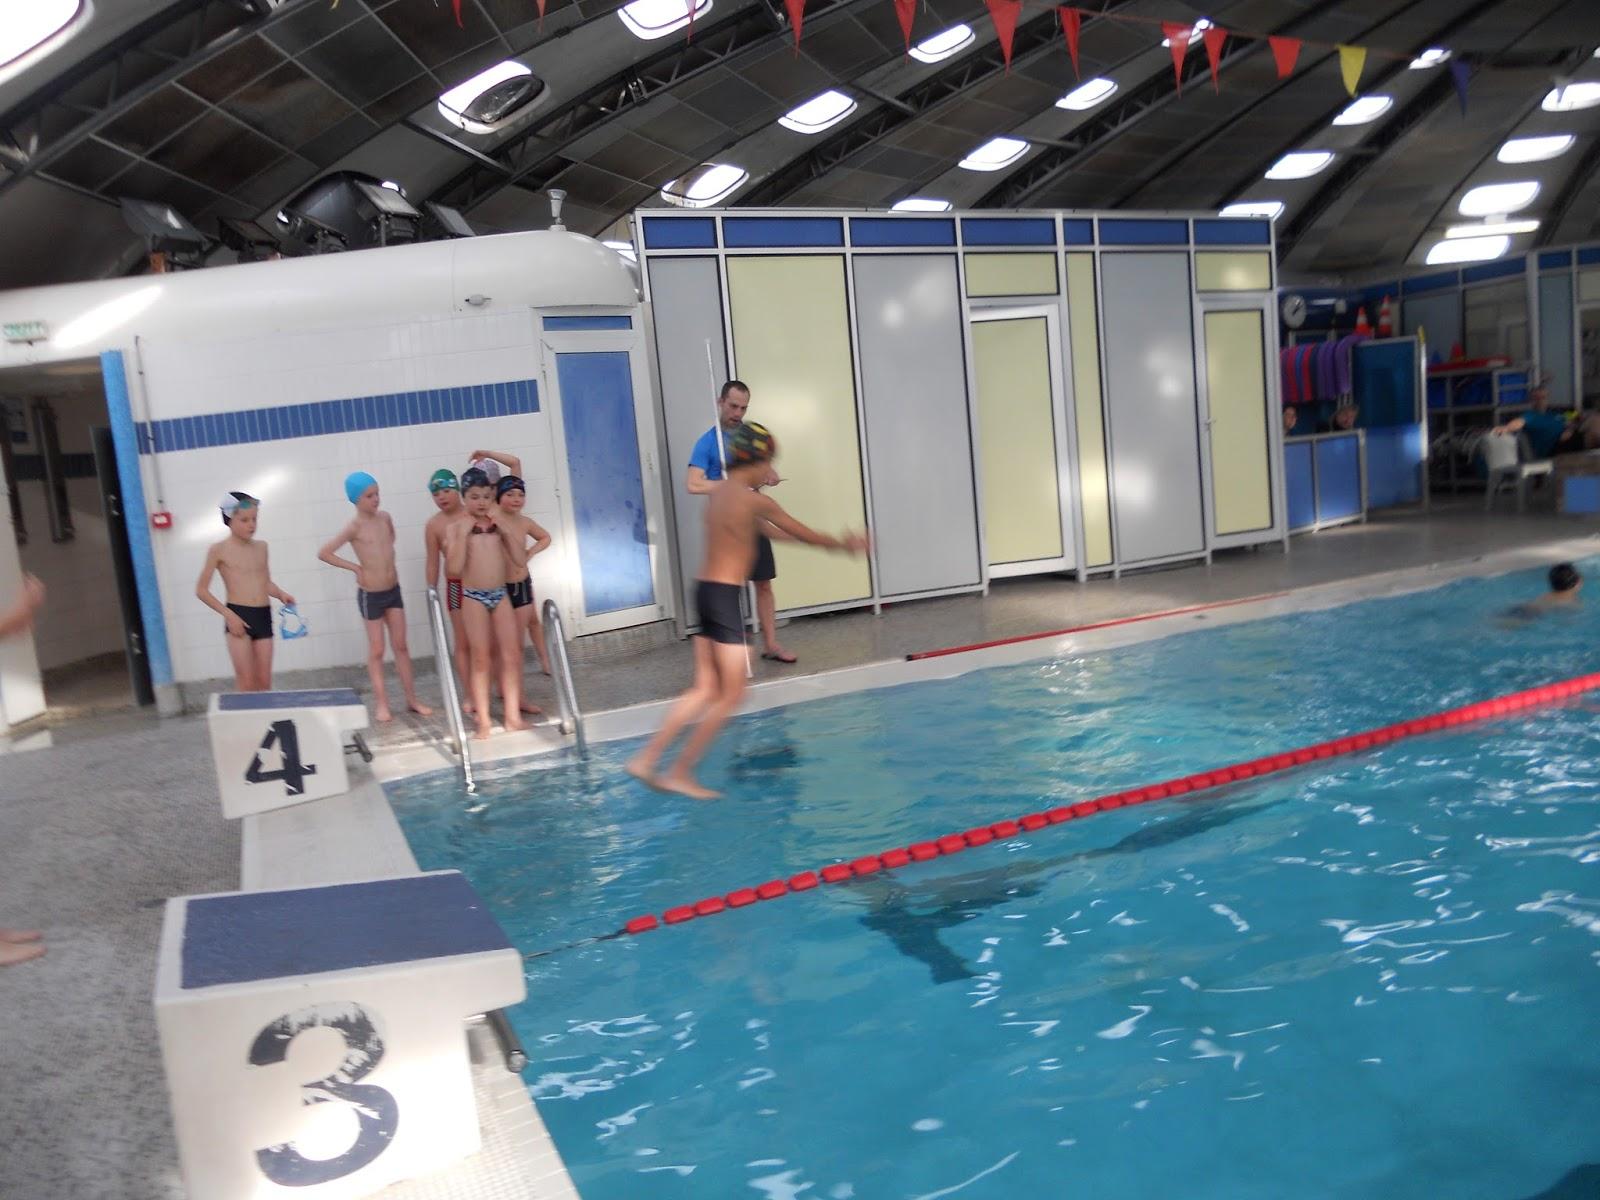 Ecole yann arthus bertrand cysoing piscine ce2 et ulis for Piscine ulis